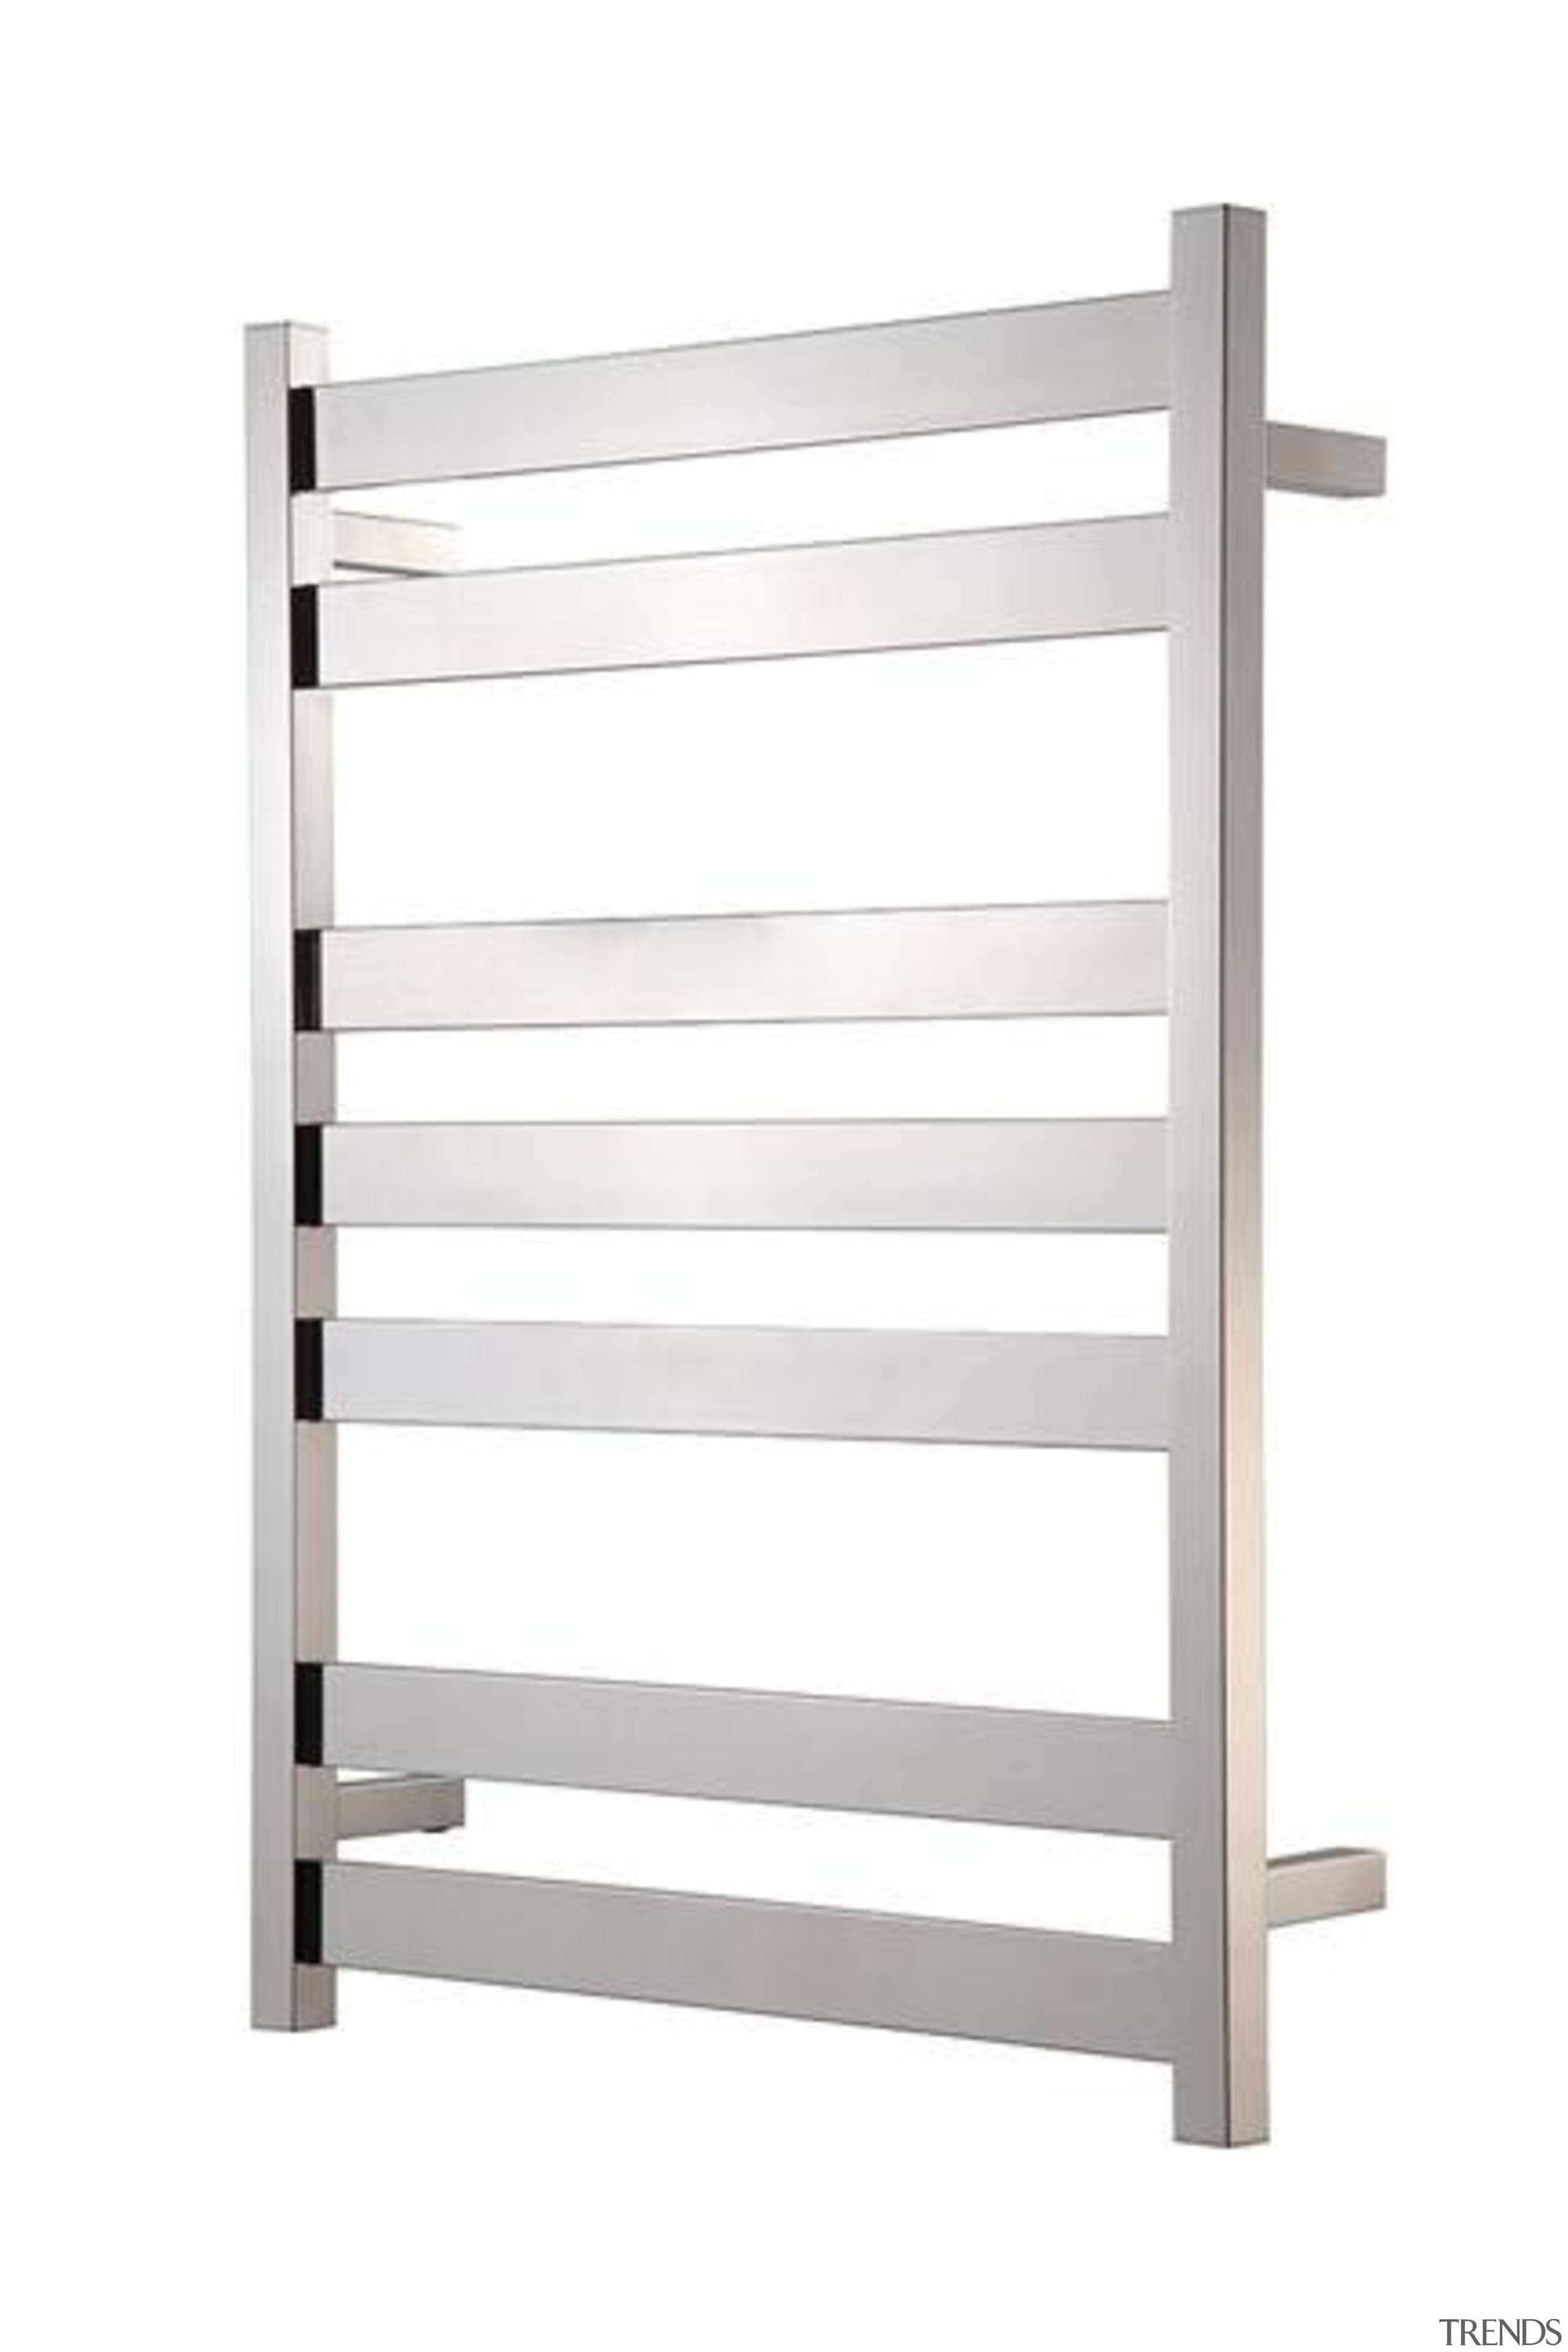 Loft 825 Towel Warmer - Loft 825 Towel furniture, product, white